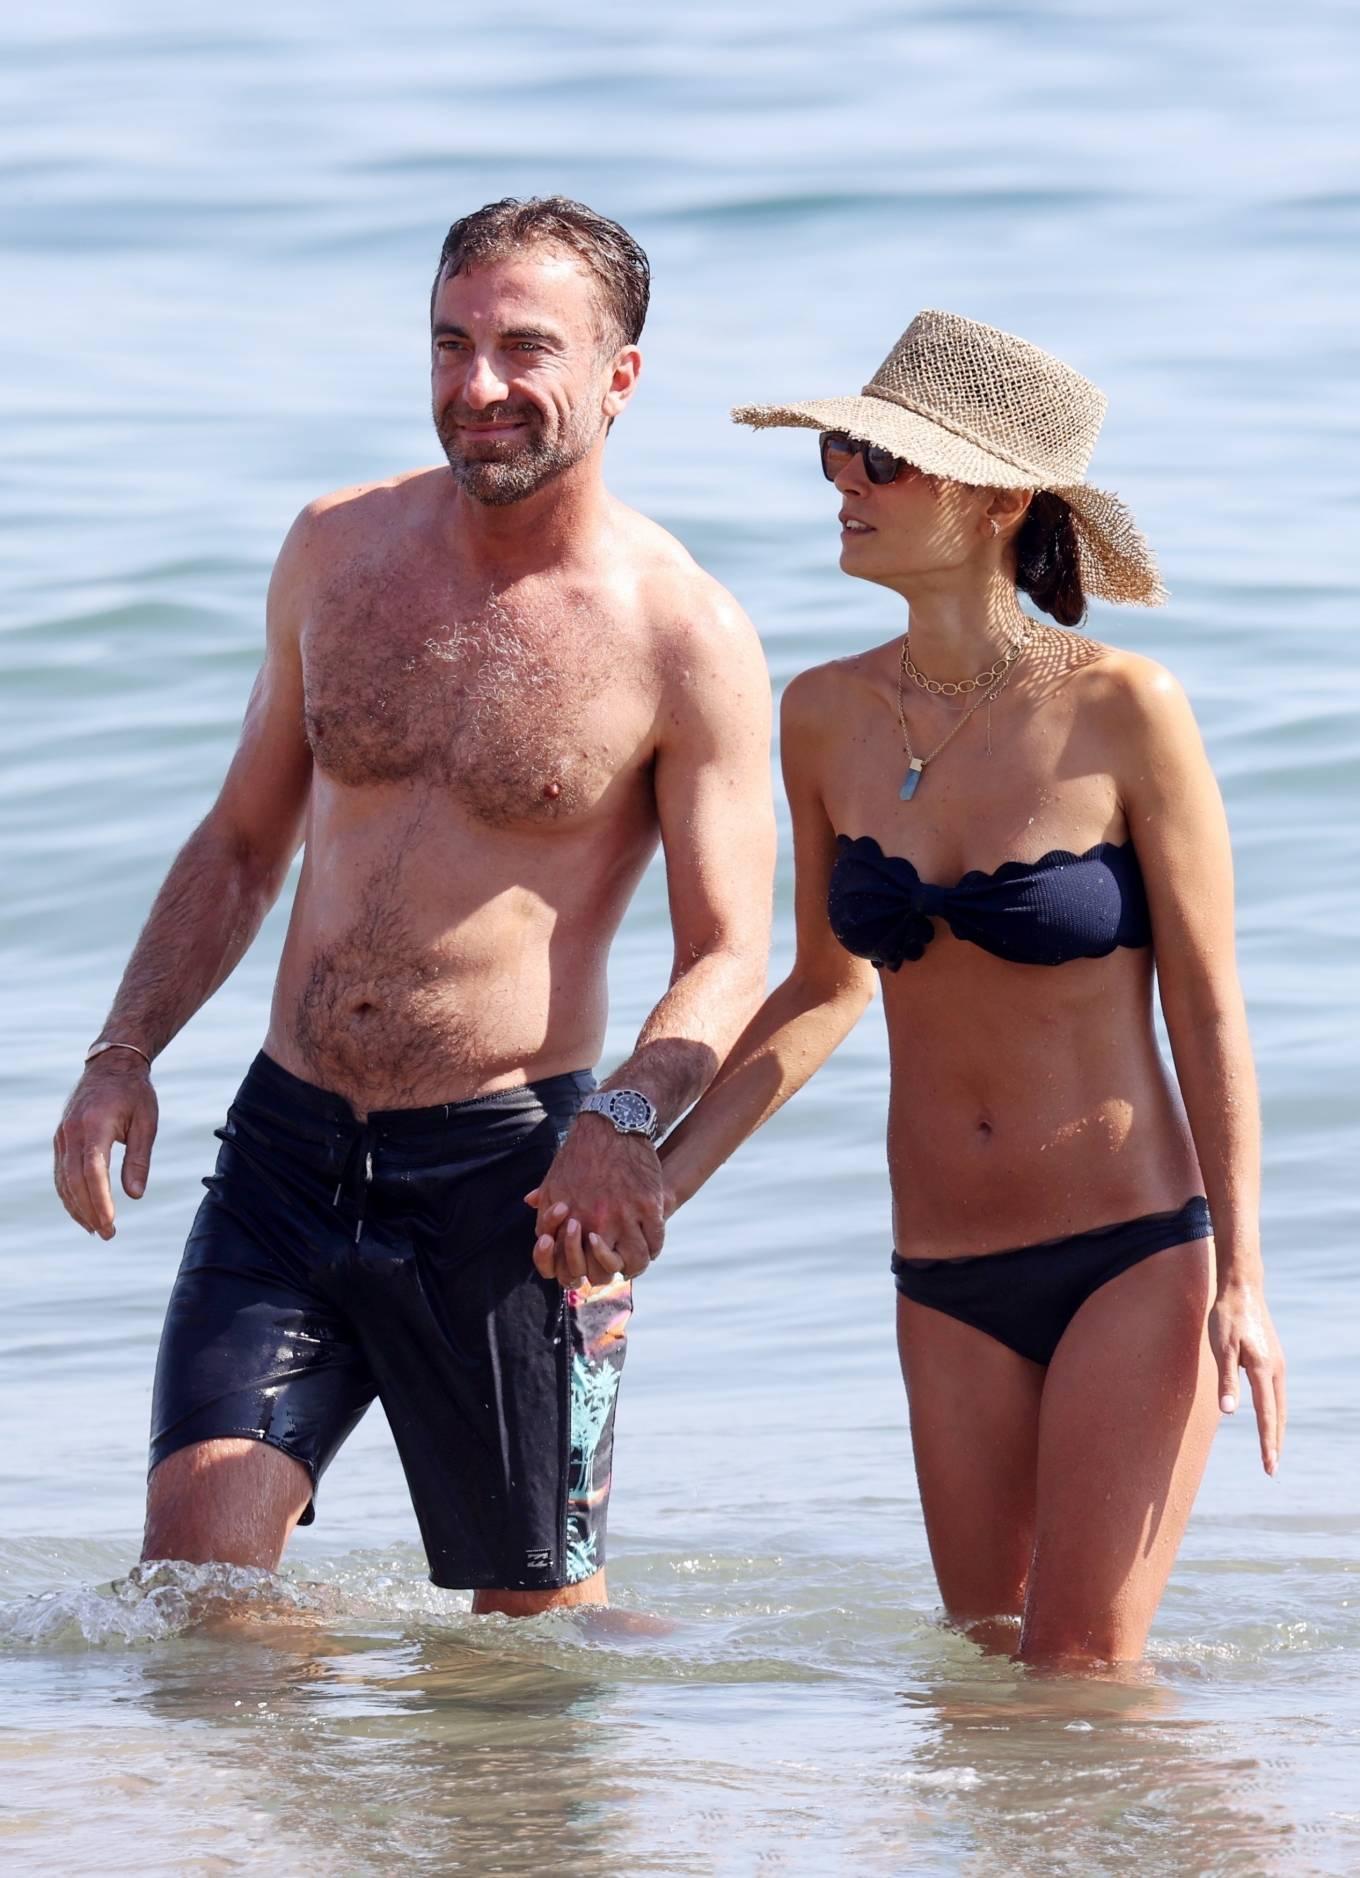 Jordana Brewster - Bikini candids with her boyfriend on the beach in Malibu